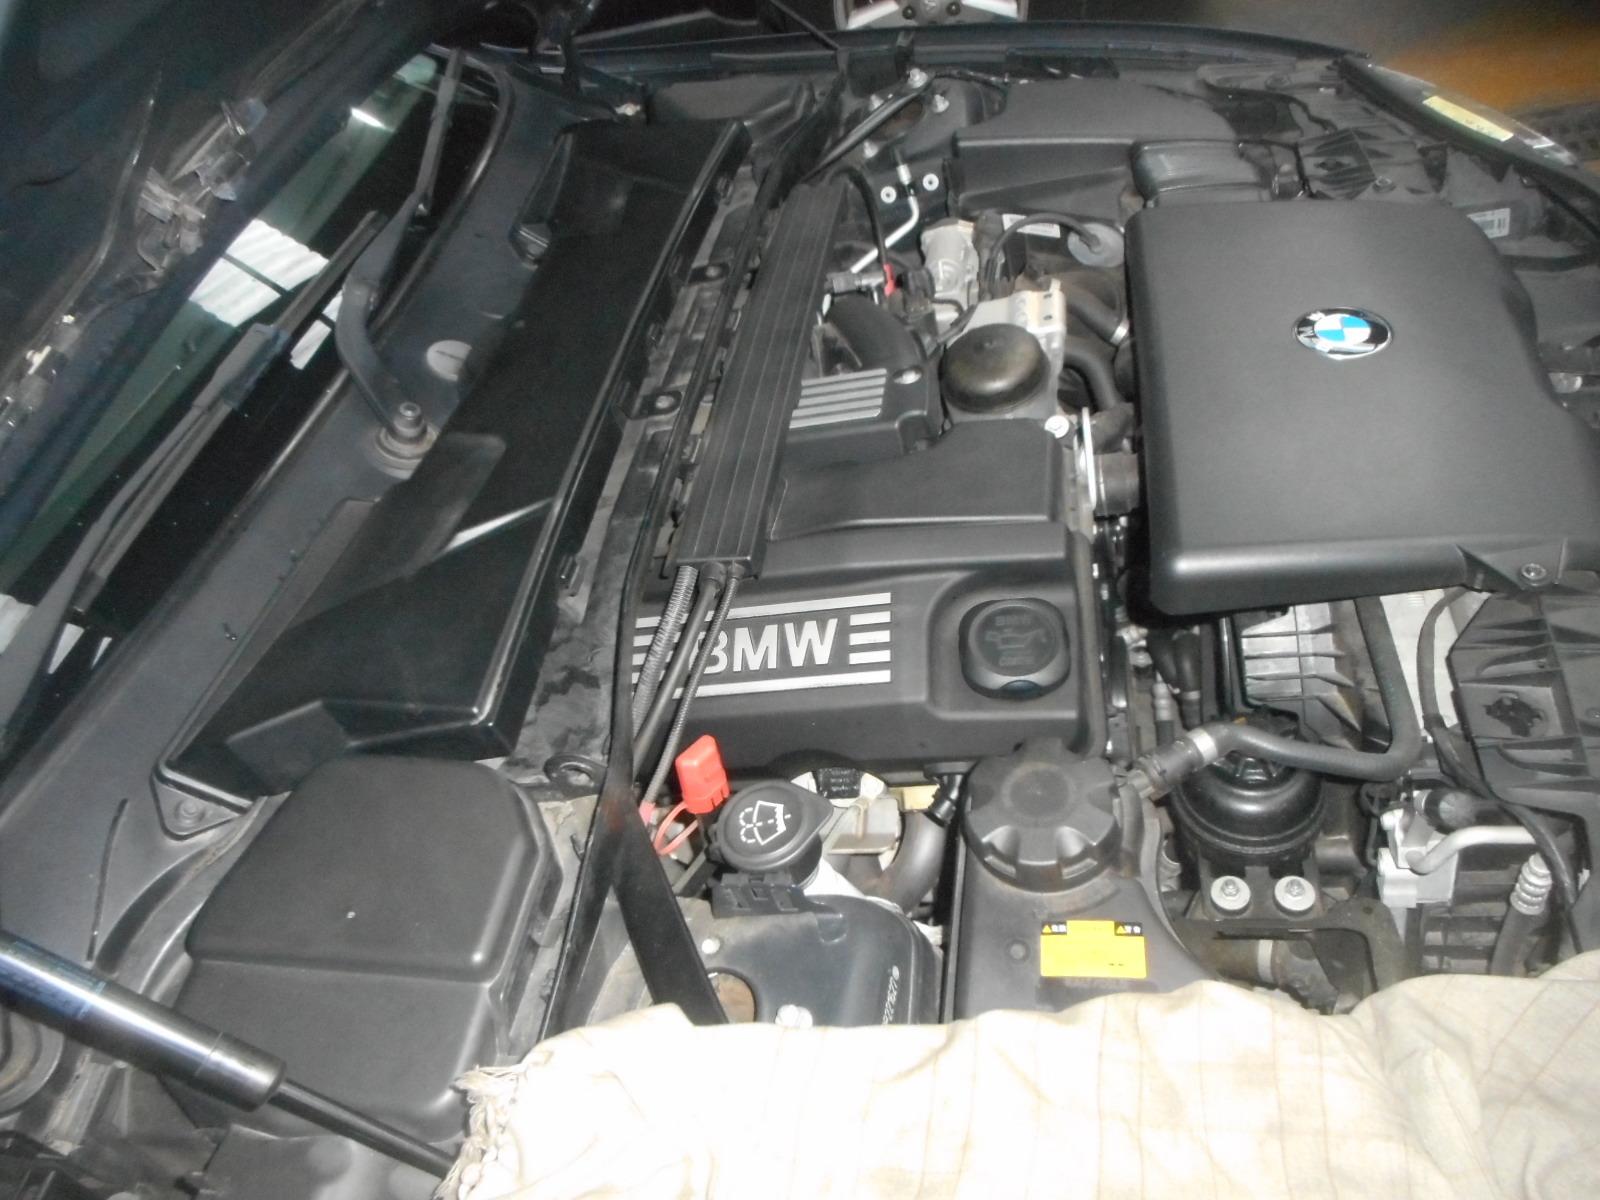 BMW 116i エンジンオイル漏れ修理(タペットカバー、バキュームポンプ)_c0267693_17430063.jpg